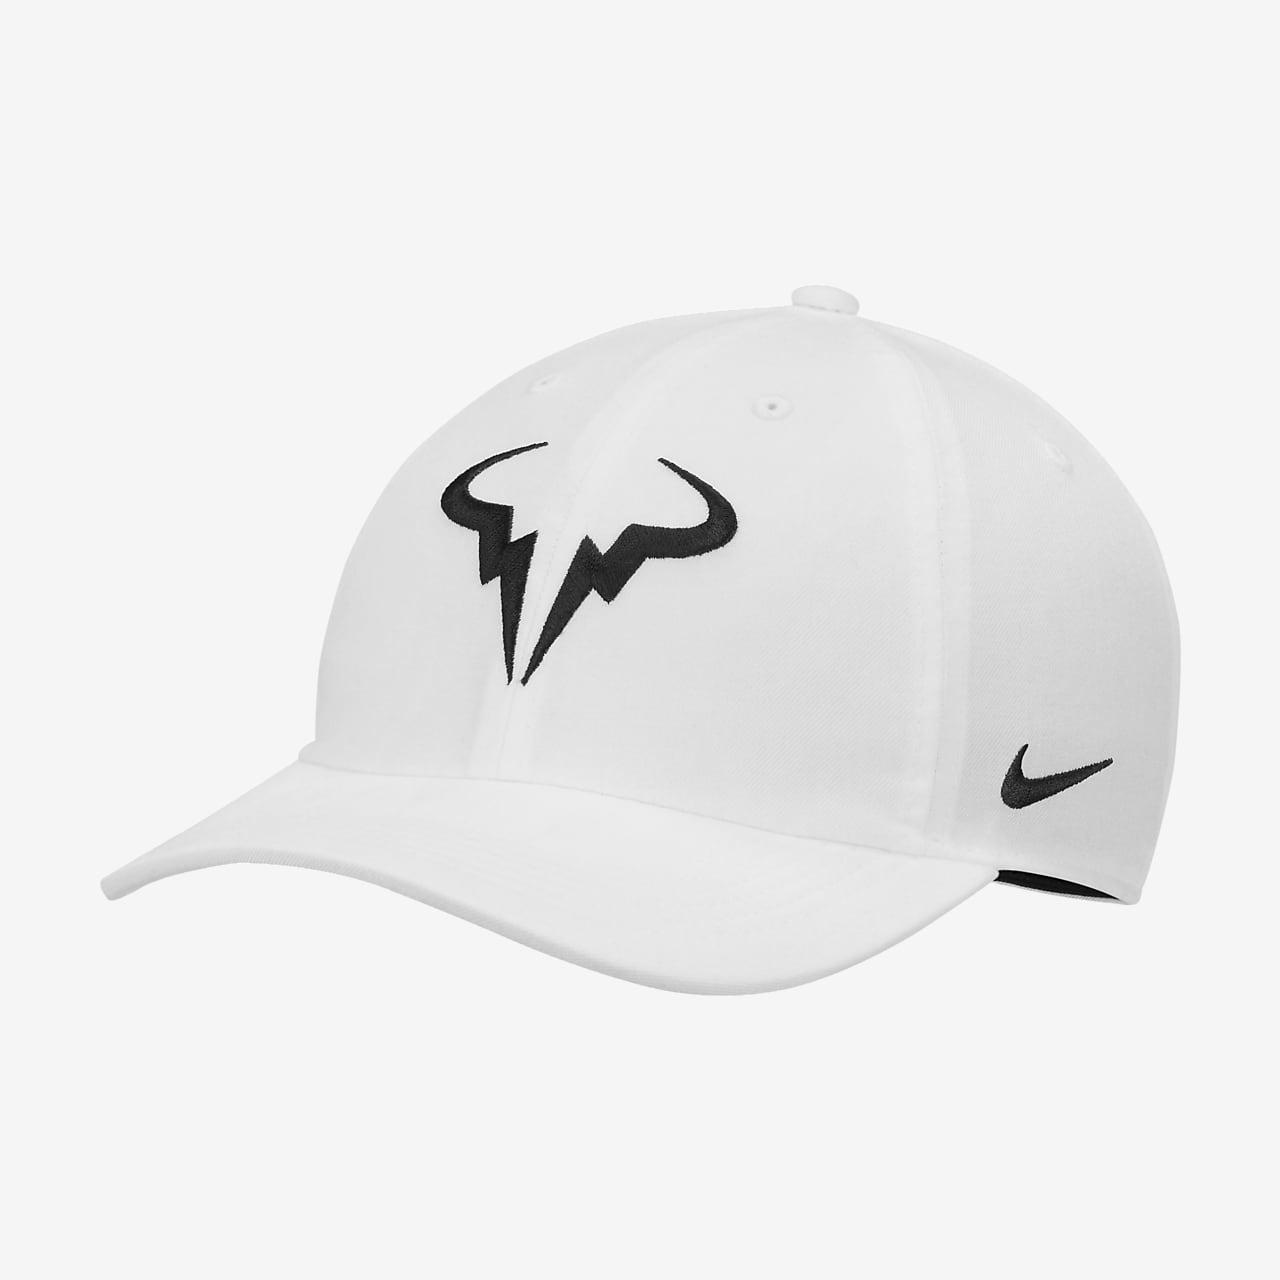 NikeCourt AeroBill Rafa H86 可调节网球运动帽